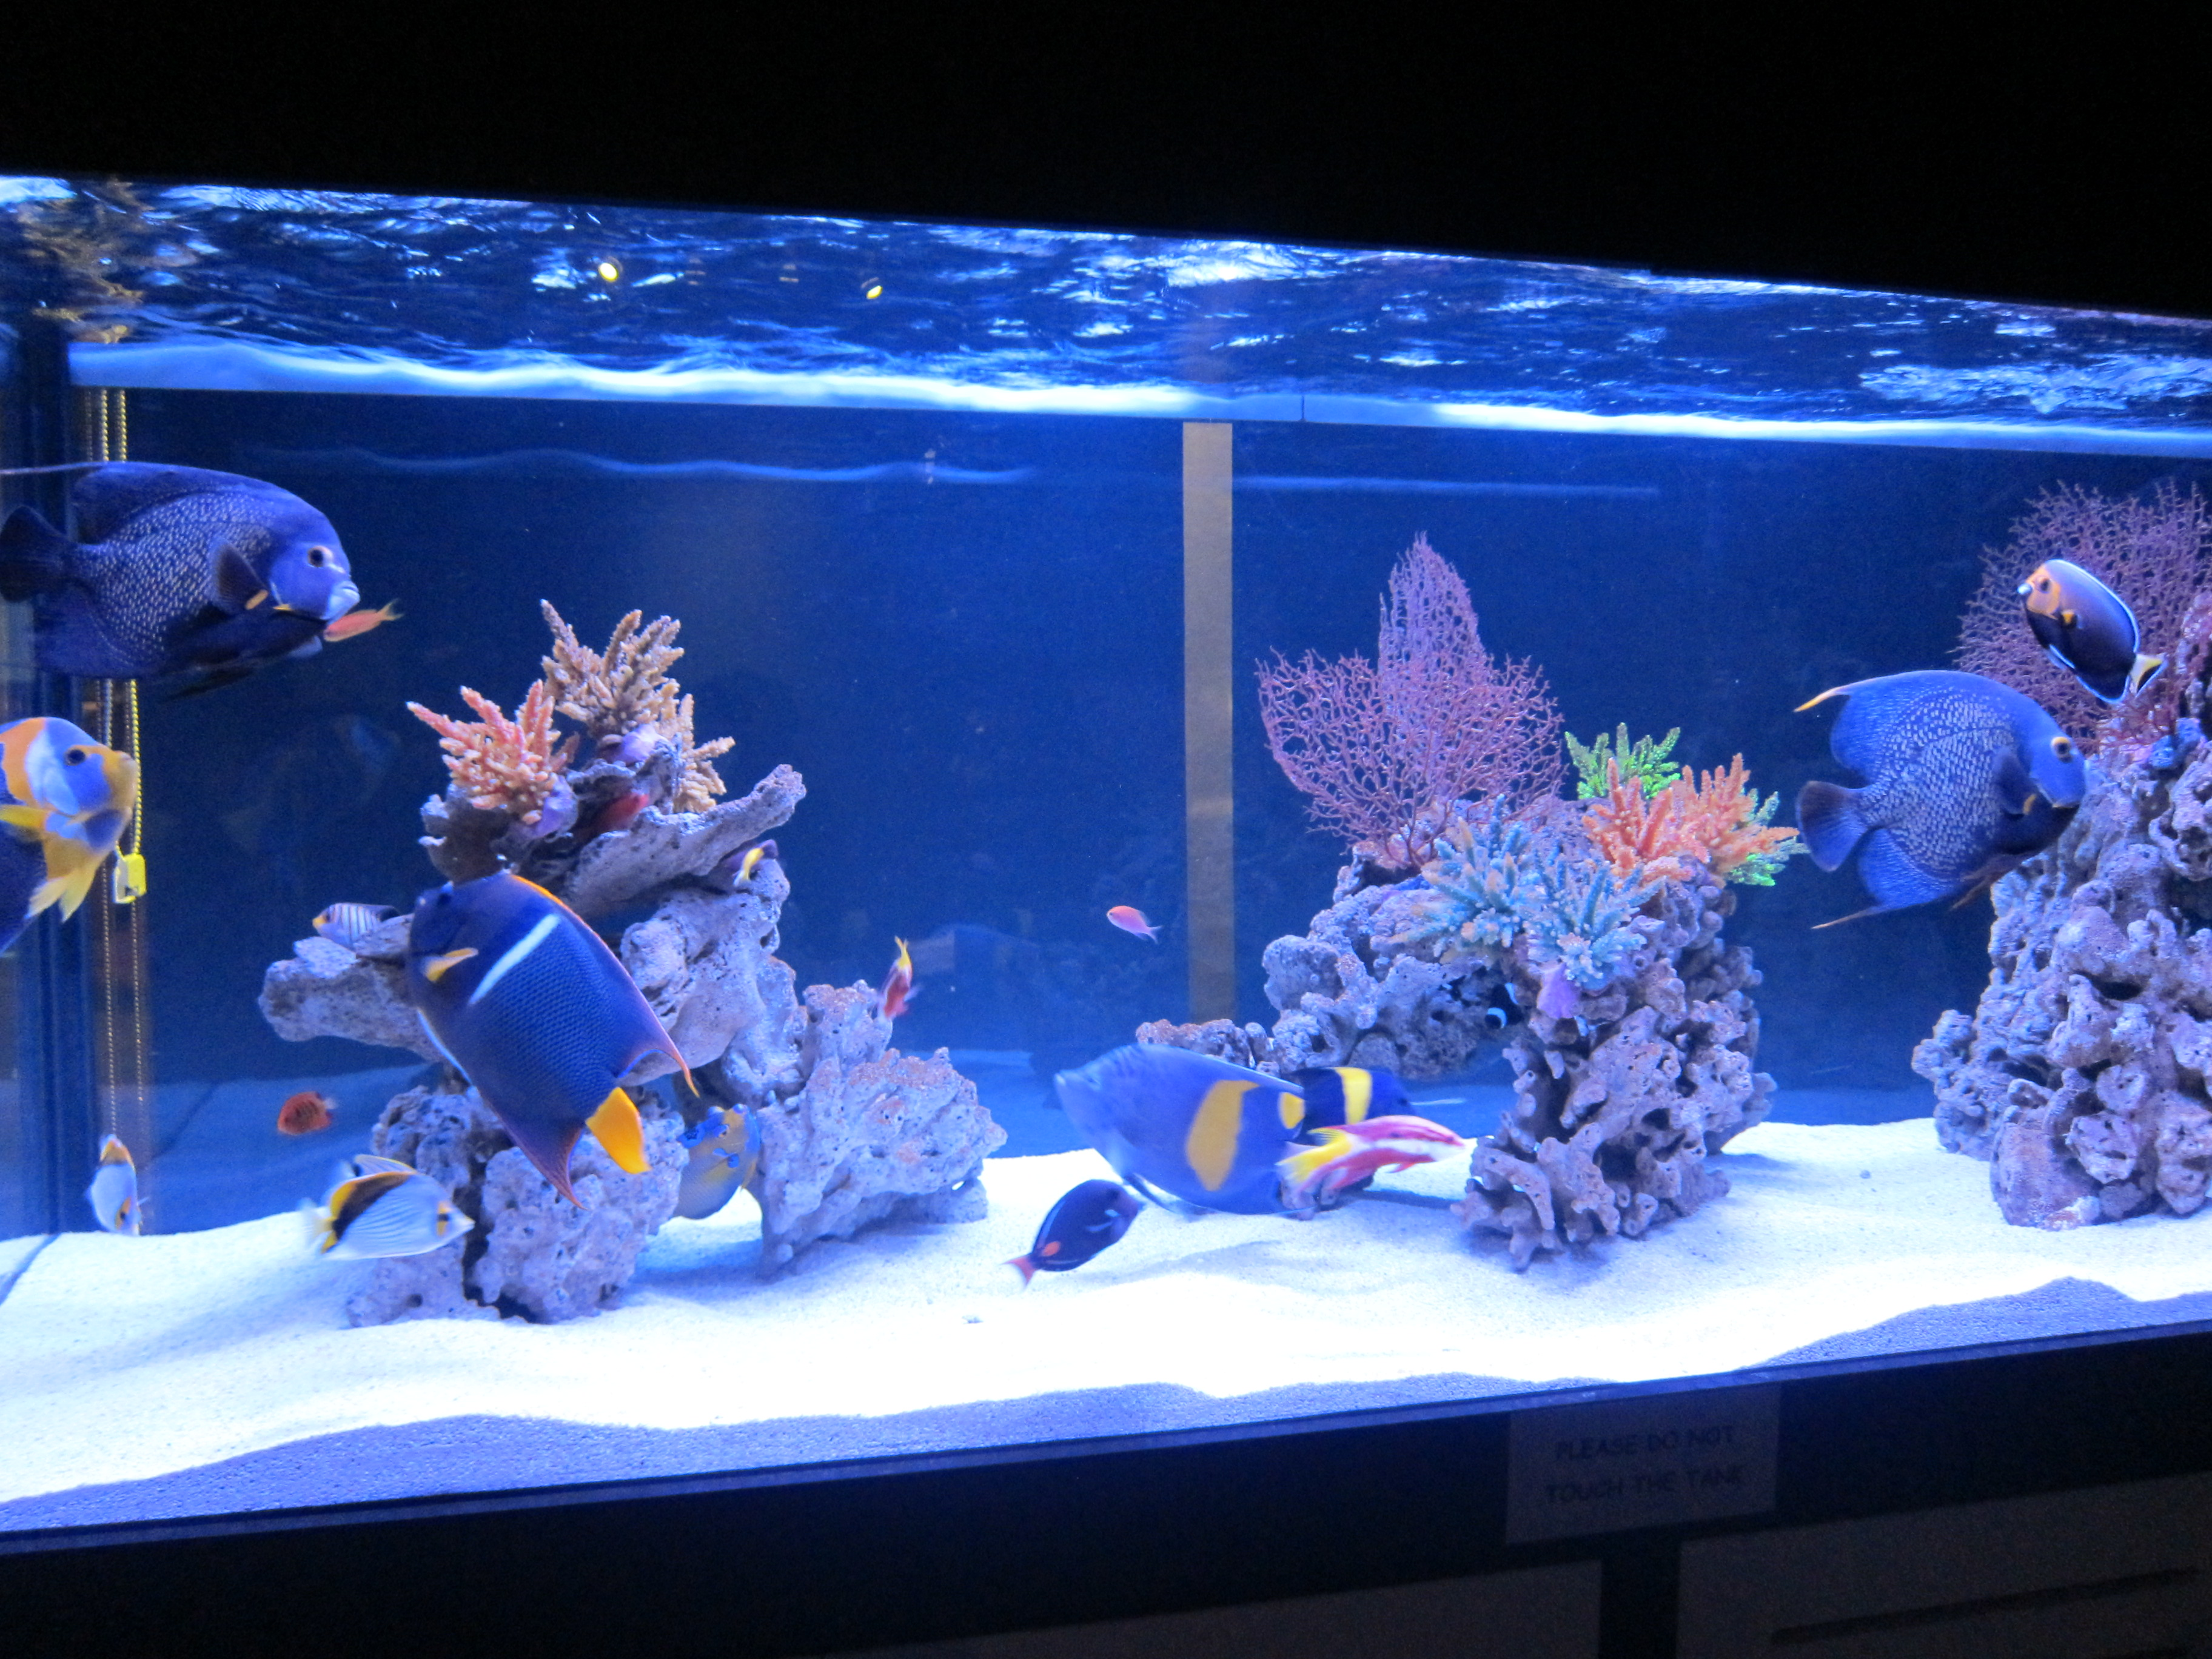 Types of Saltwater Aquariums - The Aquarium Setup, Filtration, and ...